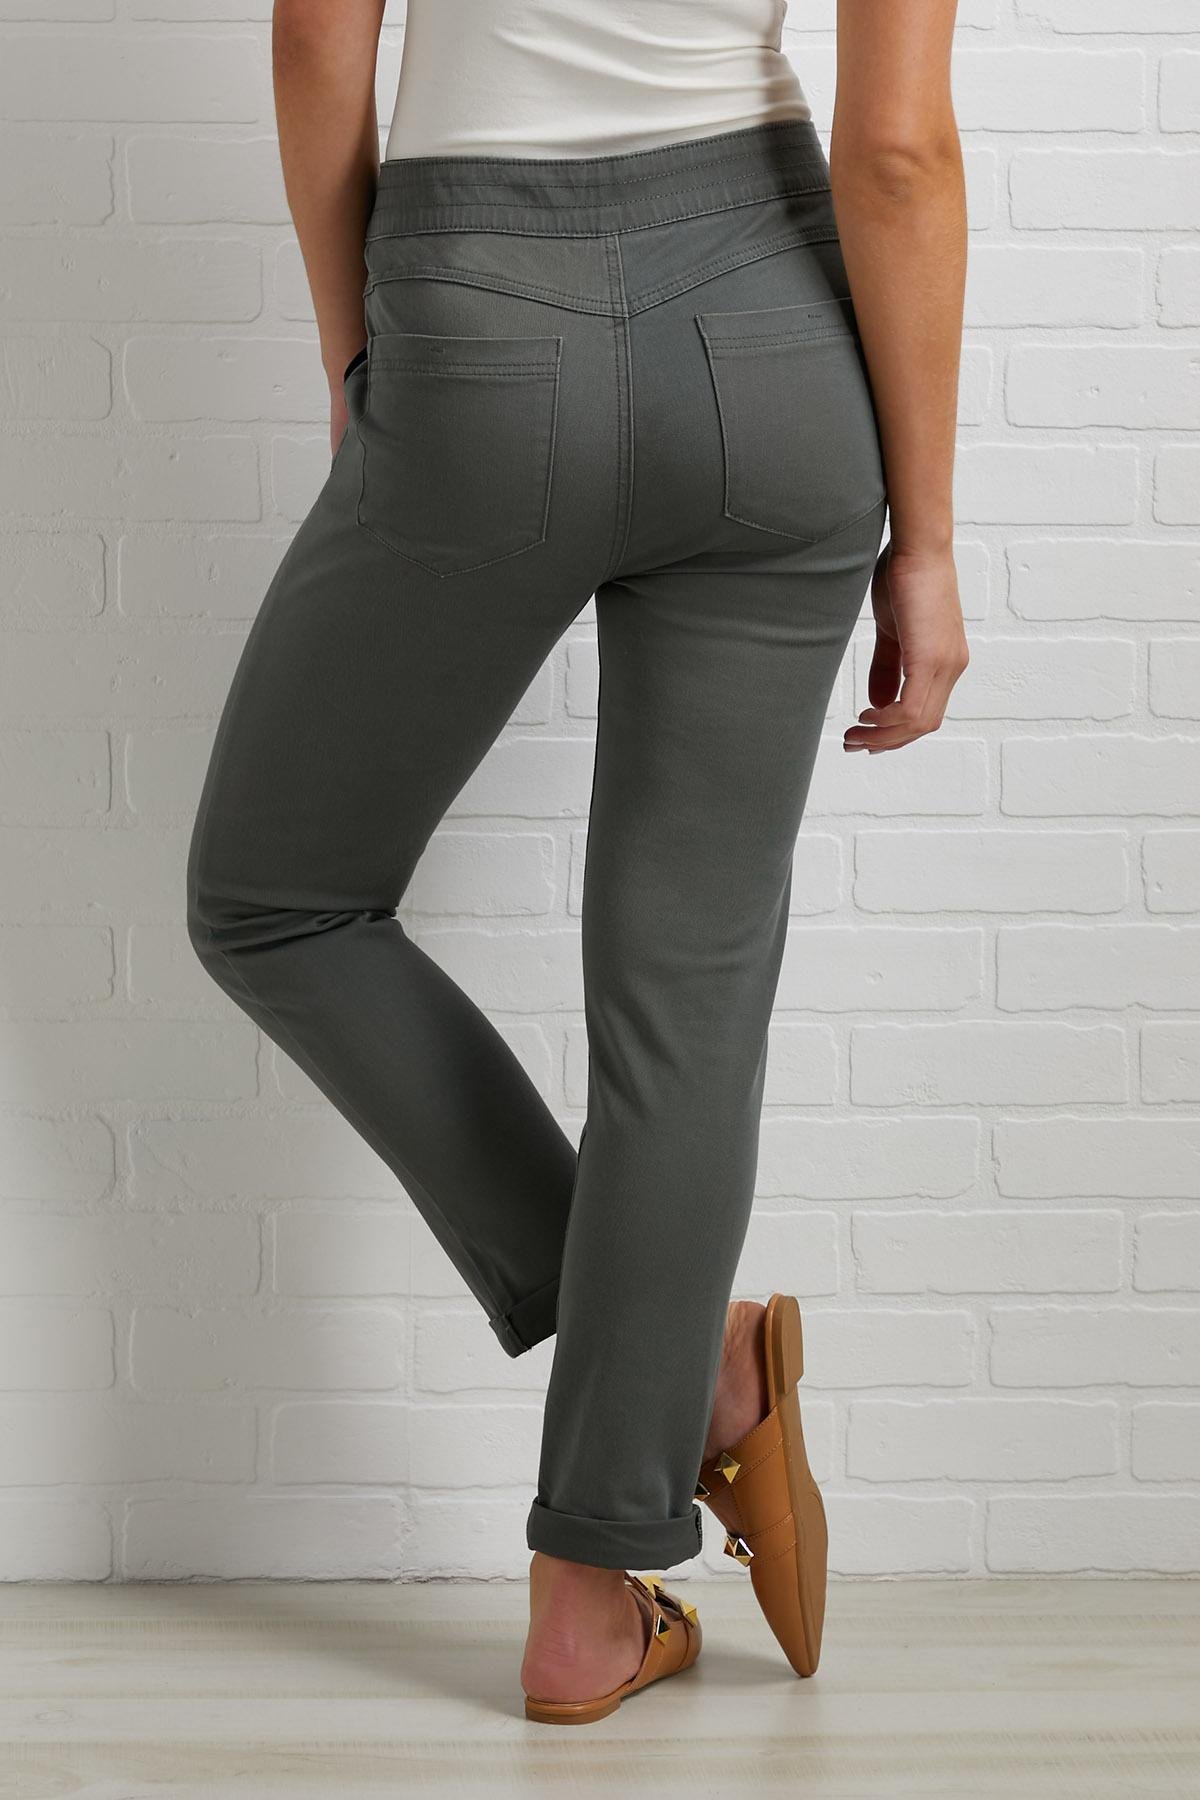 Fall Phase Pants